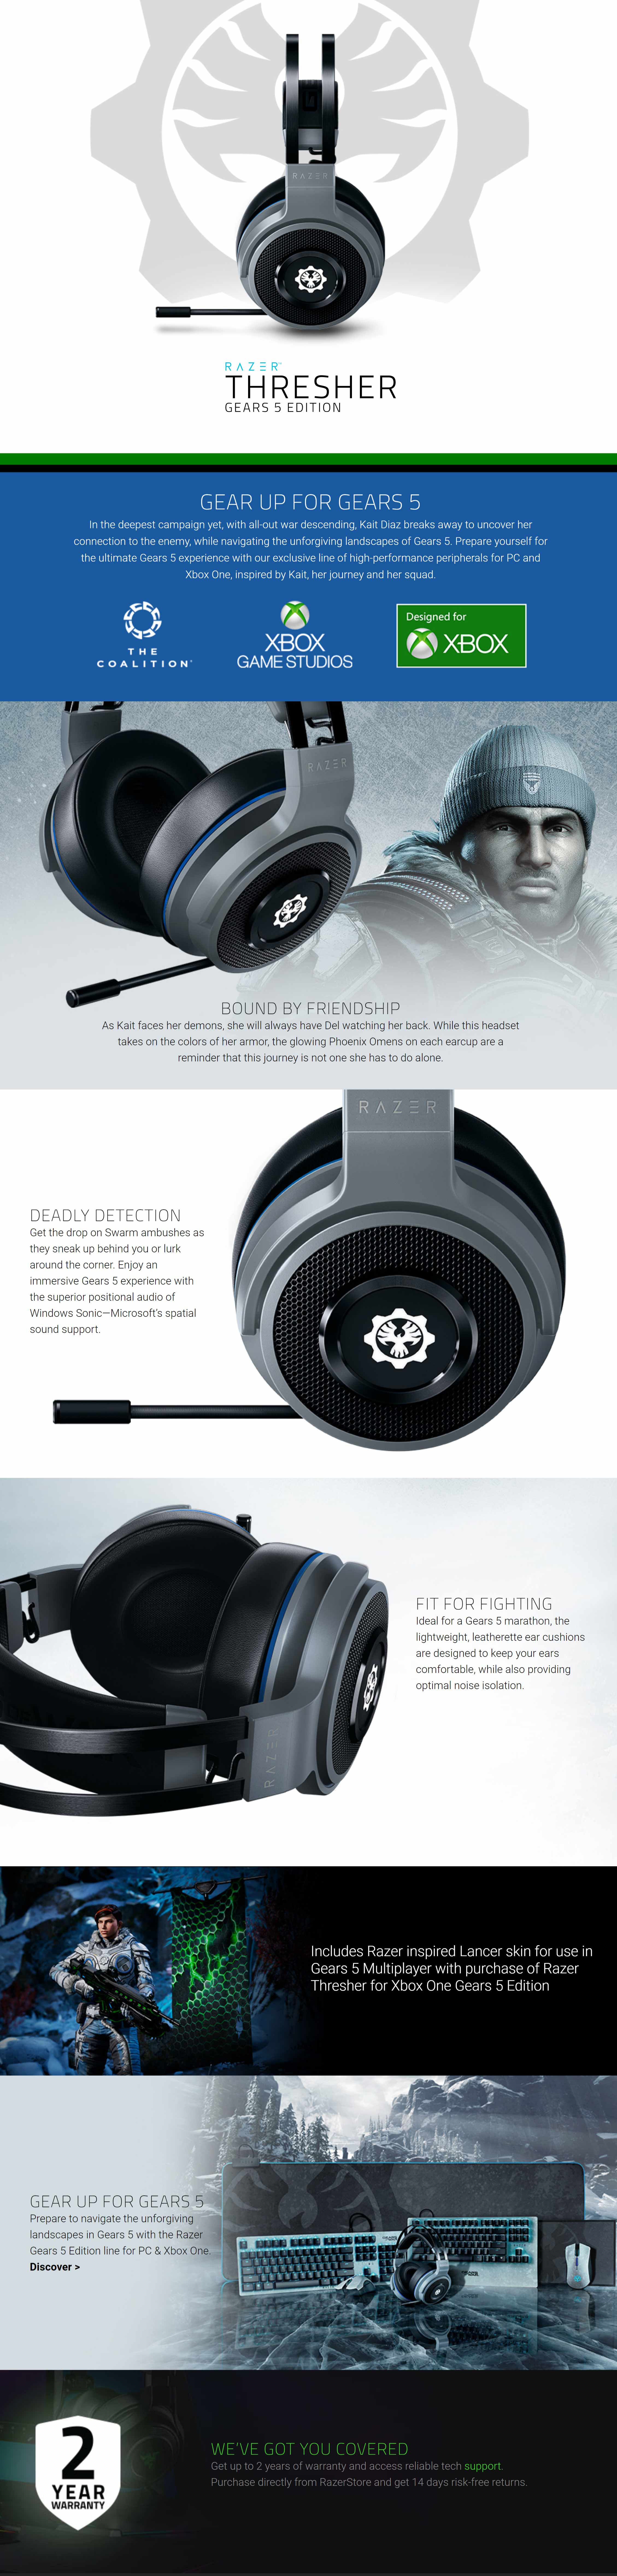 screencapture-razer-licensed-and-team-peripherals-gears-of-war-razer-thresher-for-xbox-2020-04-24-11_52_38.jpg